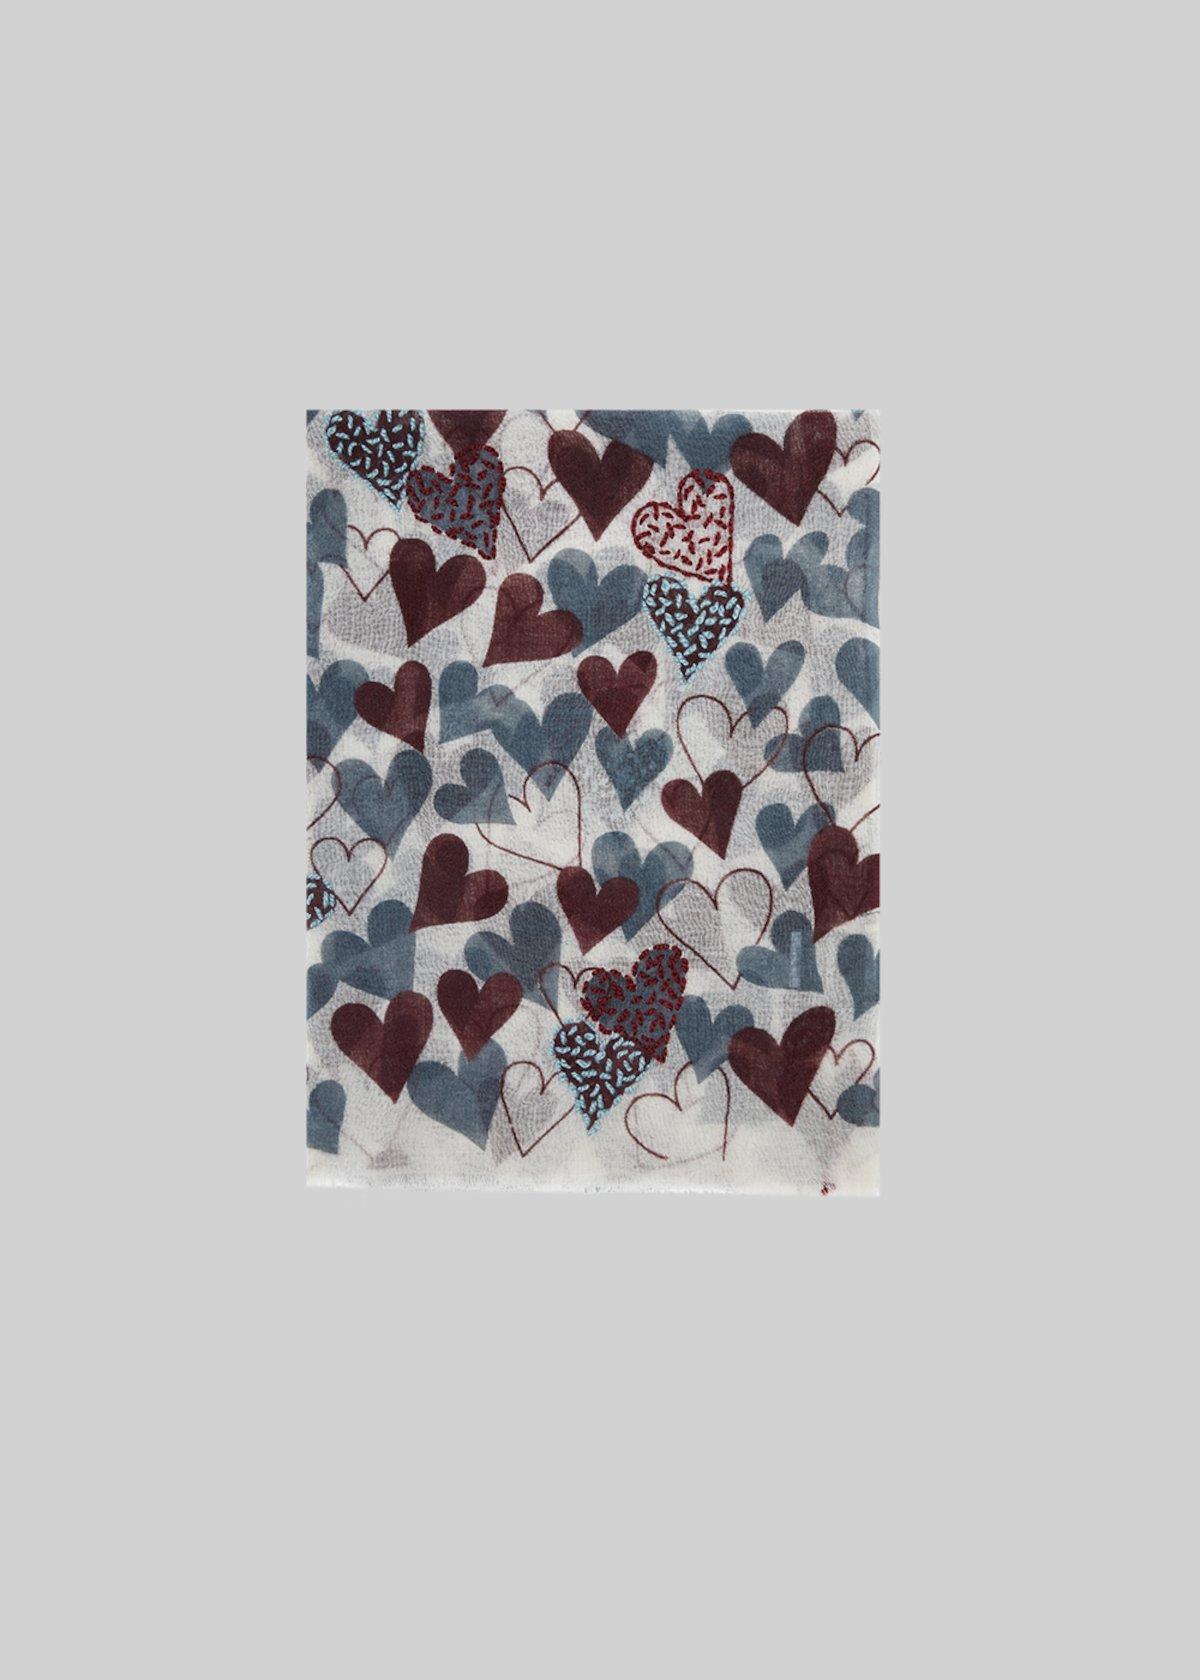 Say scarf in fantasy hearts wool - Garlic Fantasia